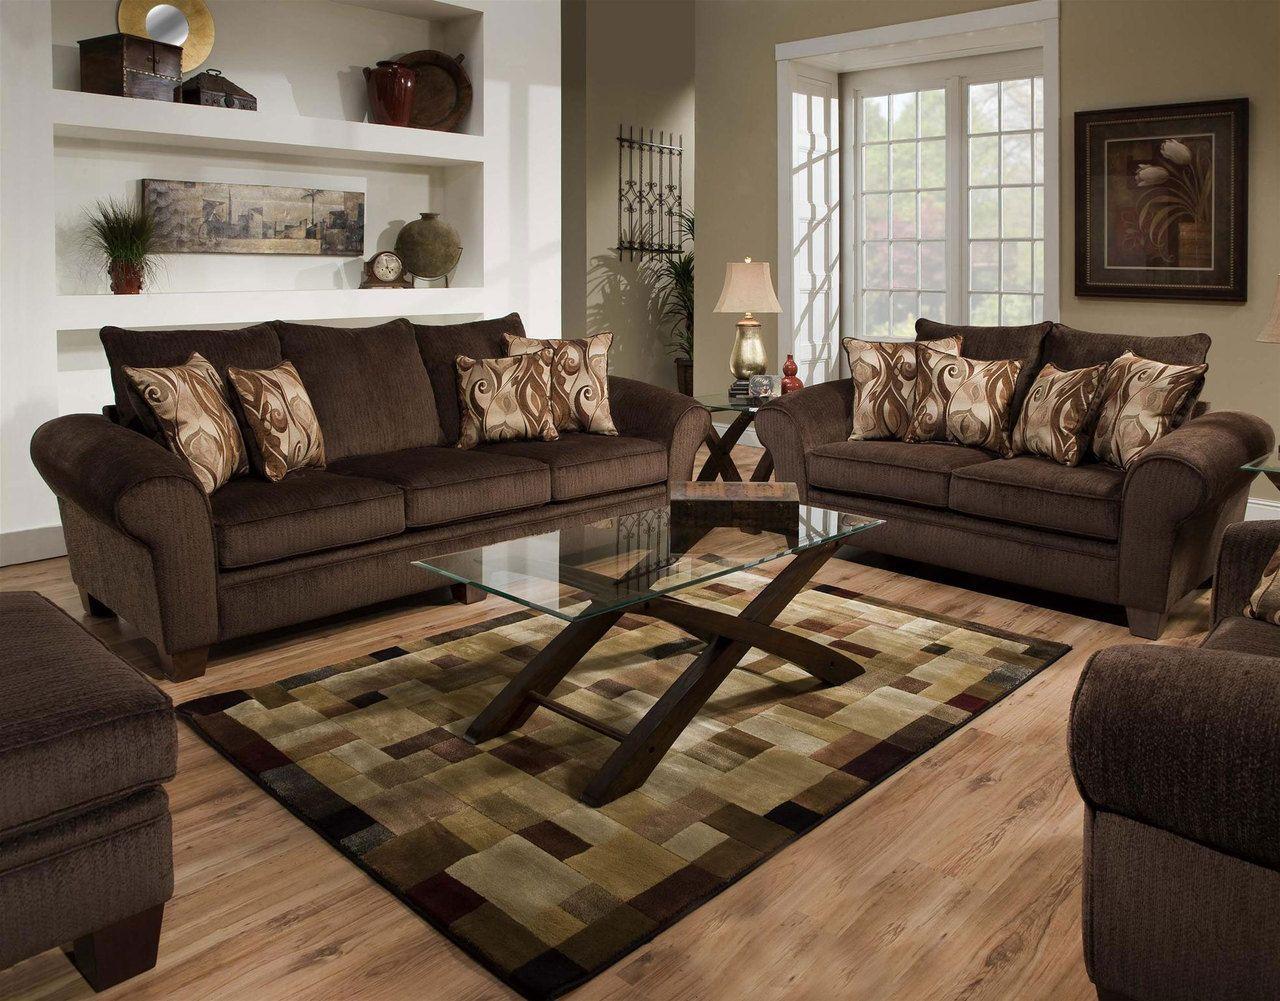 Envy Godiva Sofa  Brown living room decor, Sofa and loveseat set